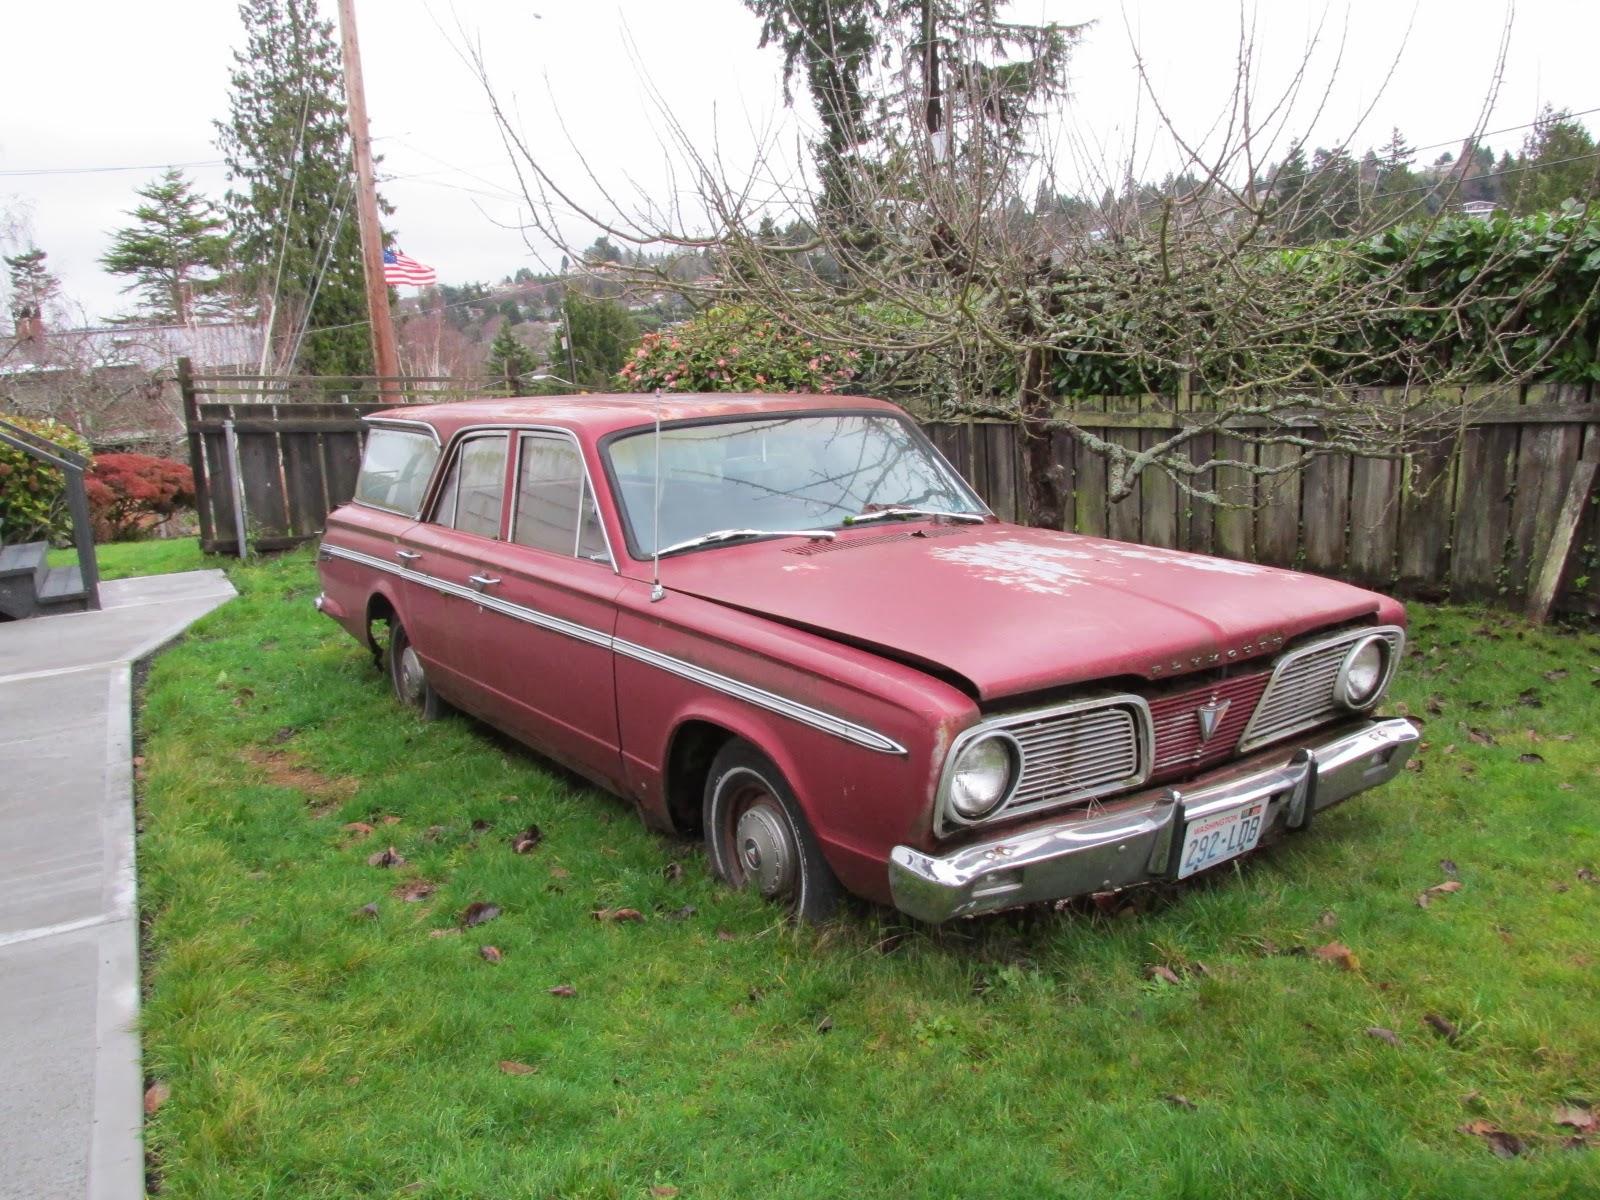 Seattle's Classics: 1966 Plymouth Valiant Wagon